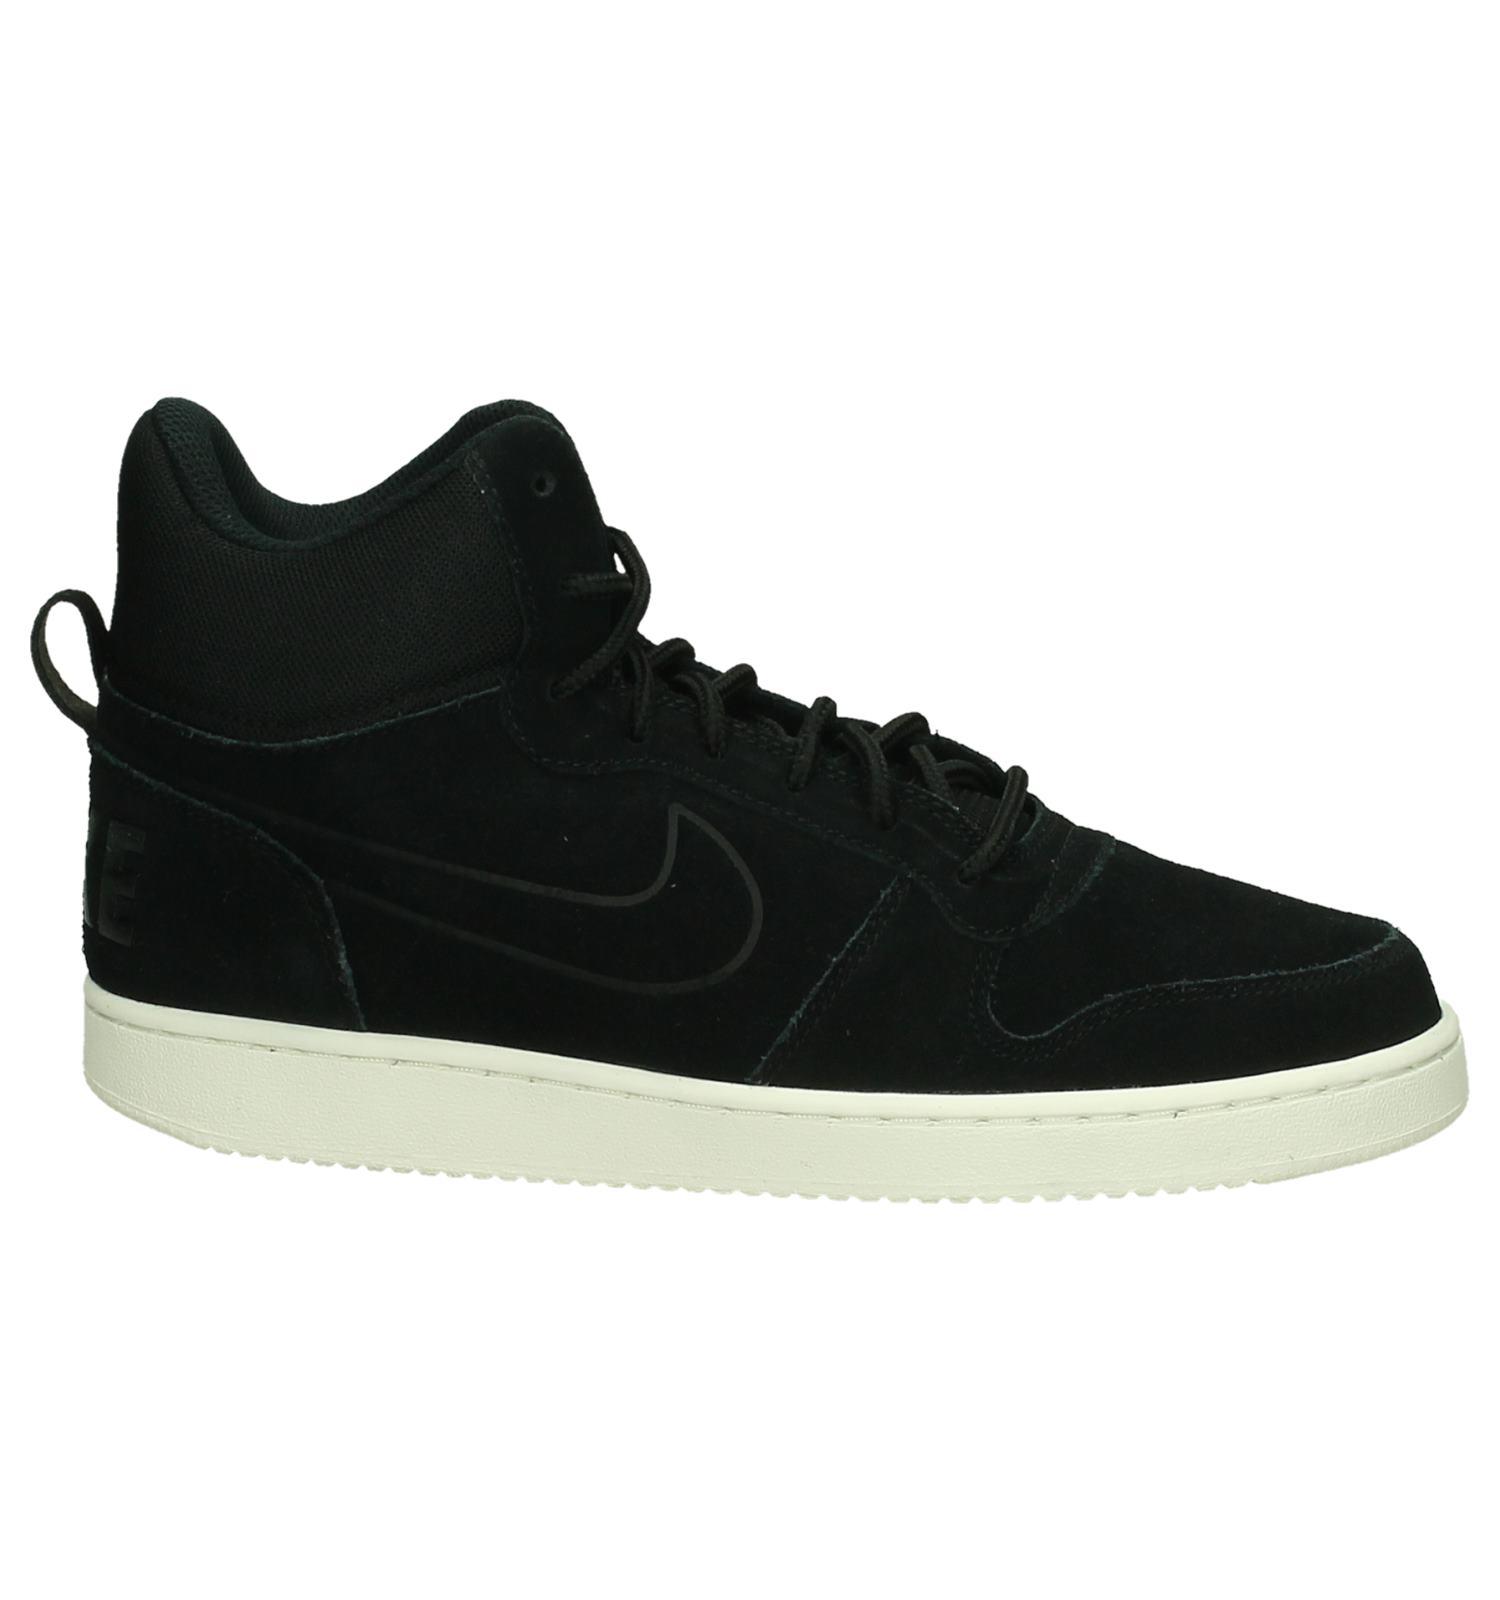 01278208f53 Nike Court Borough Mid Zwarte Sneakers, Zwart, pdp. 360° Vergroten